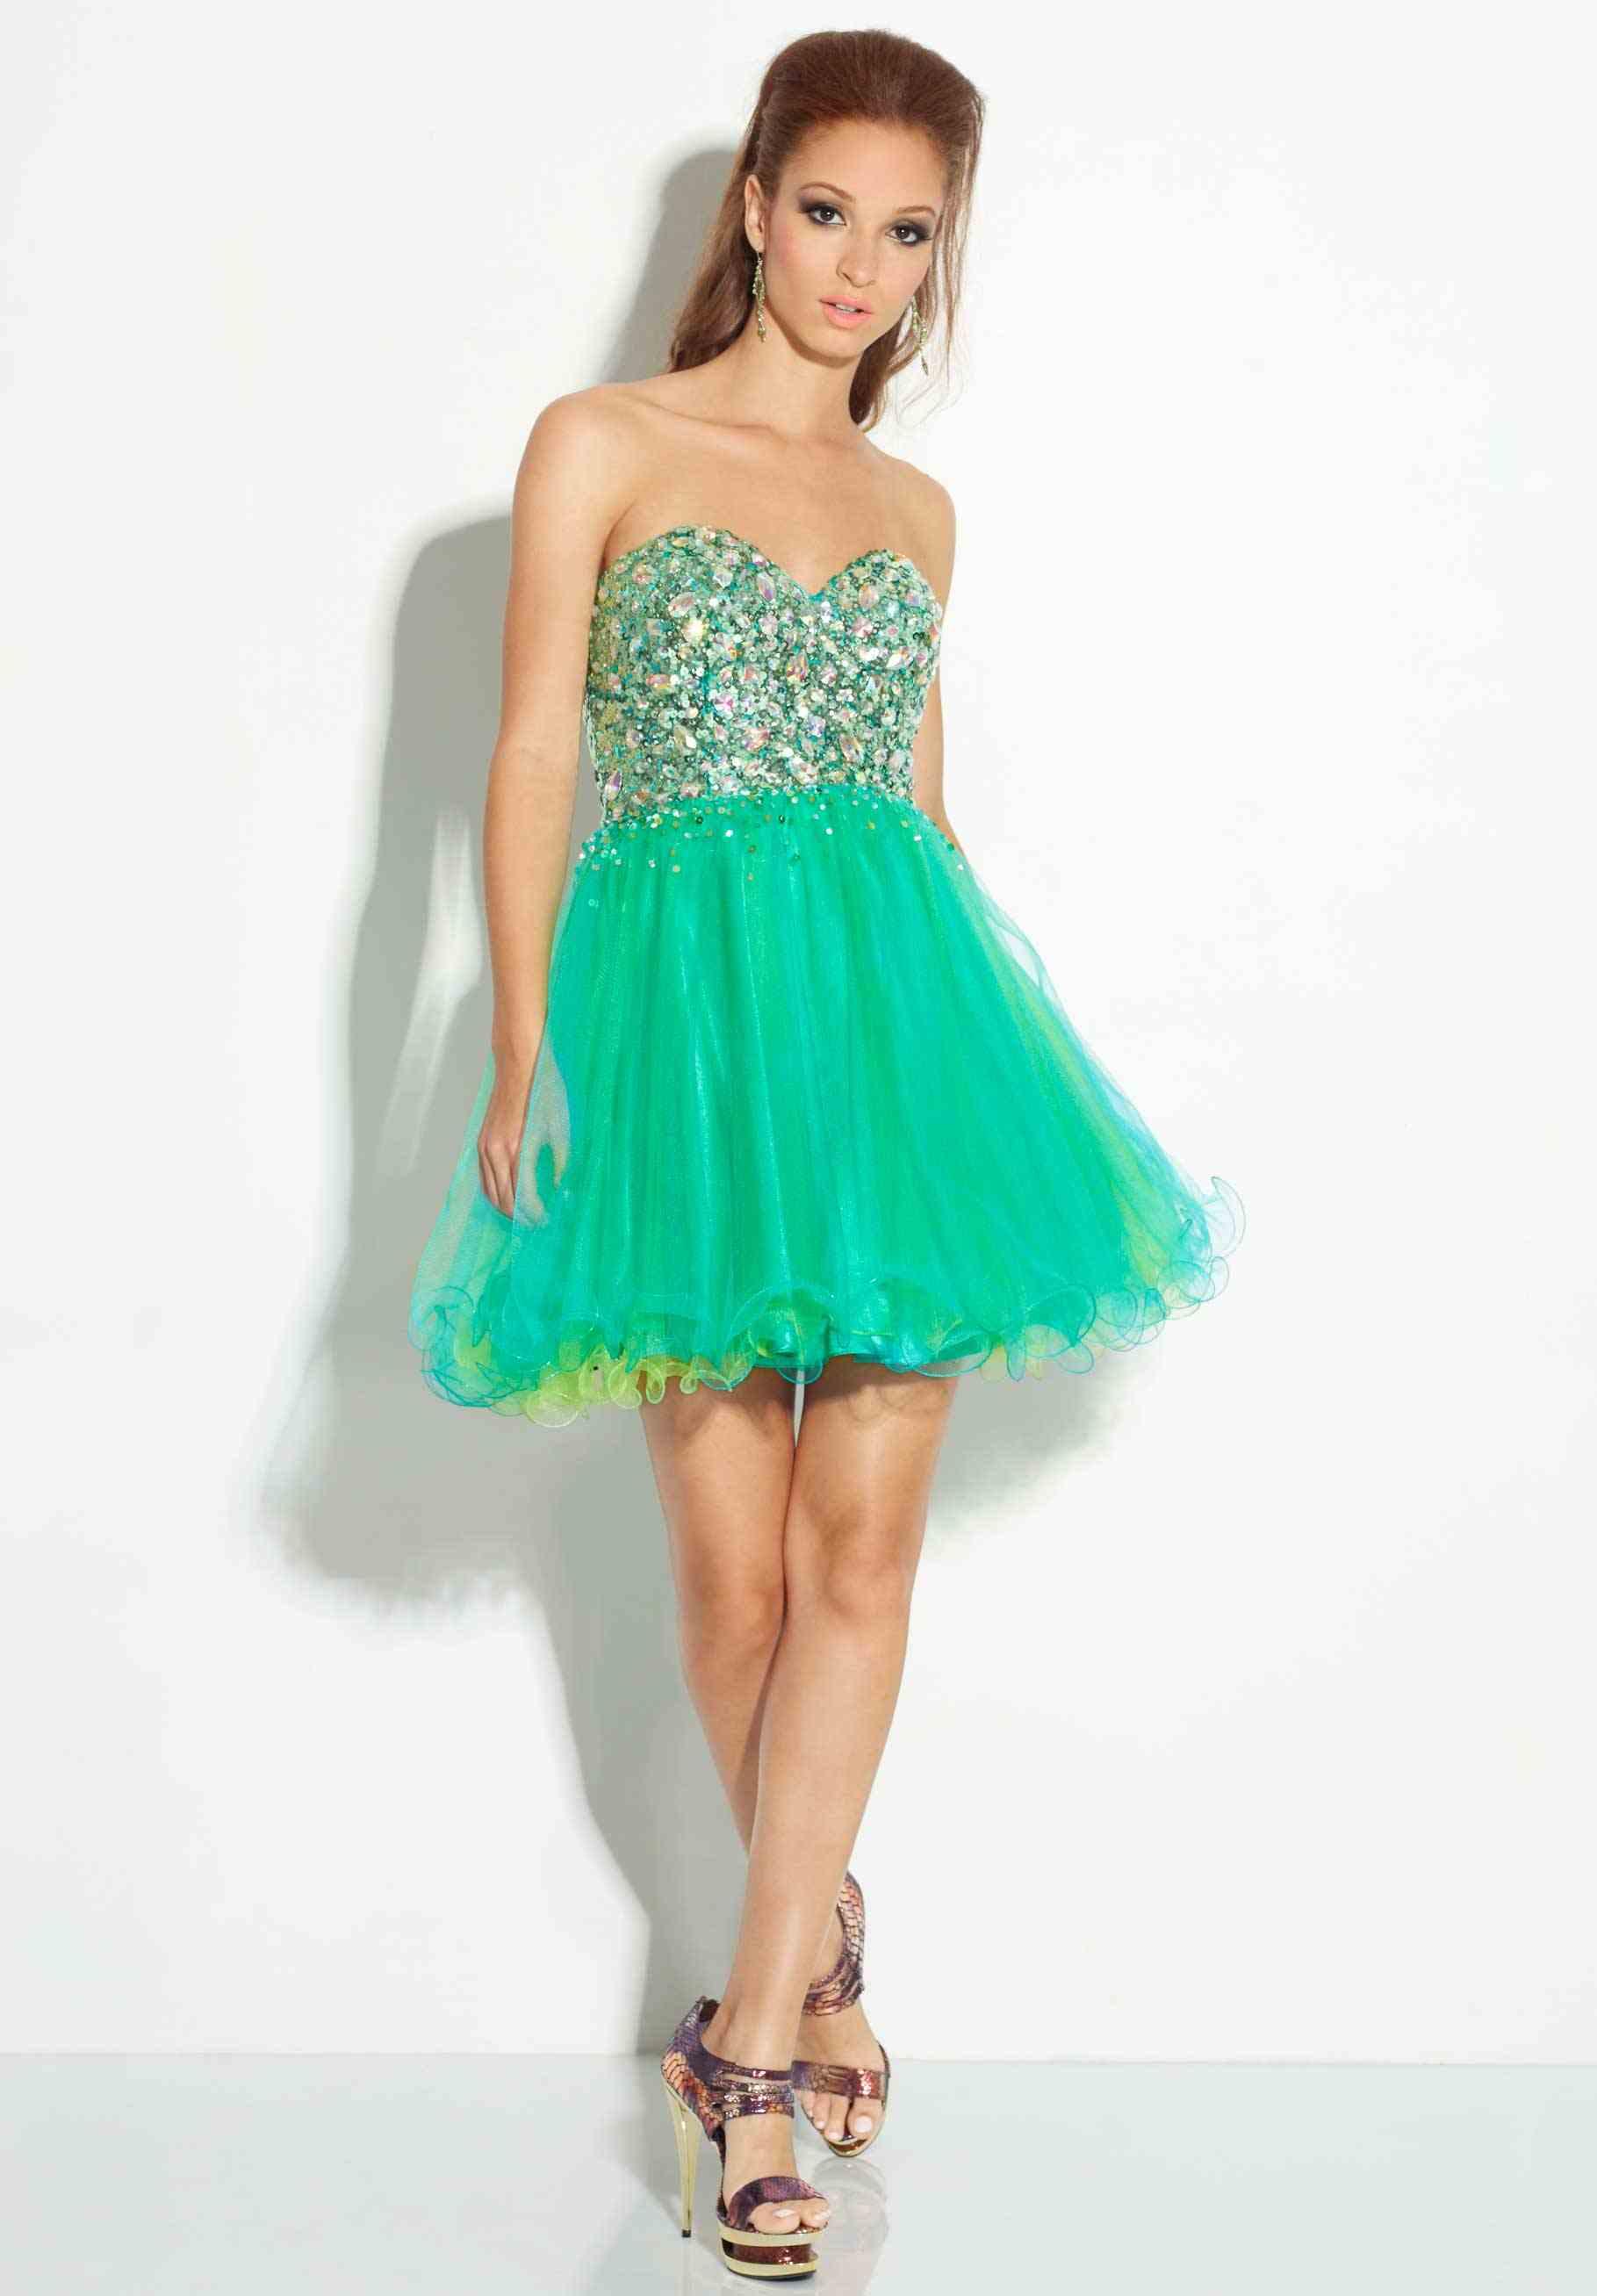 Green Short Prom Dresses | Dress images